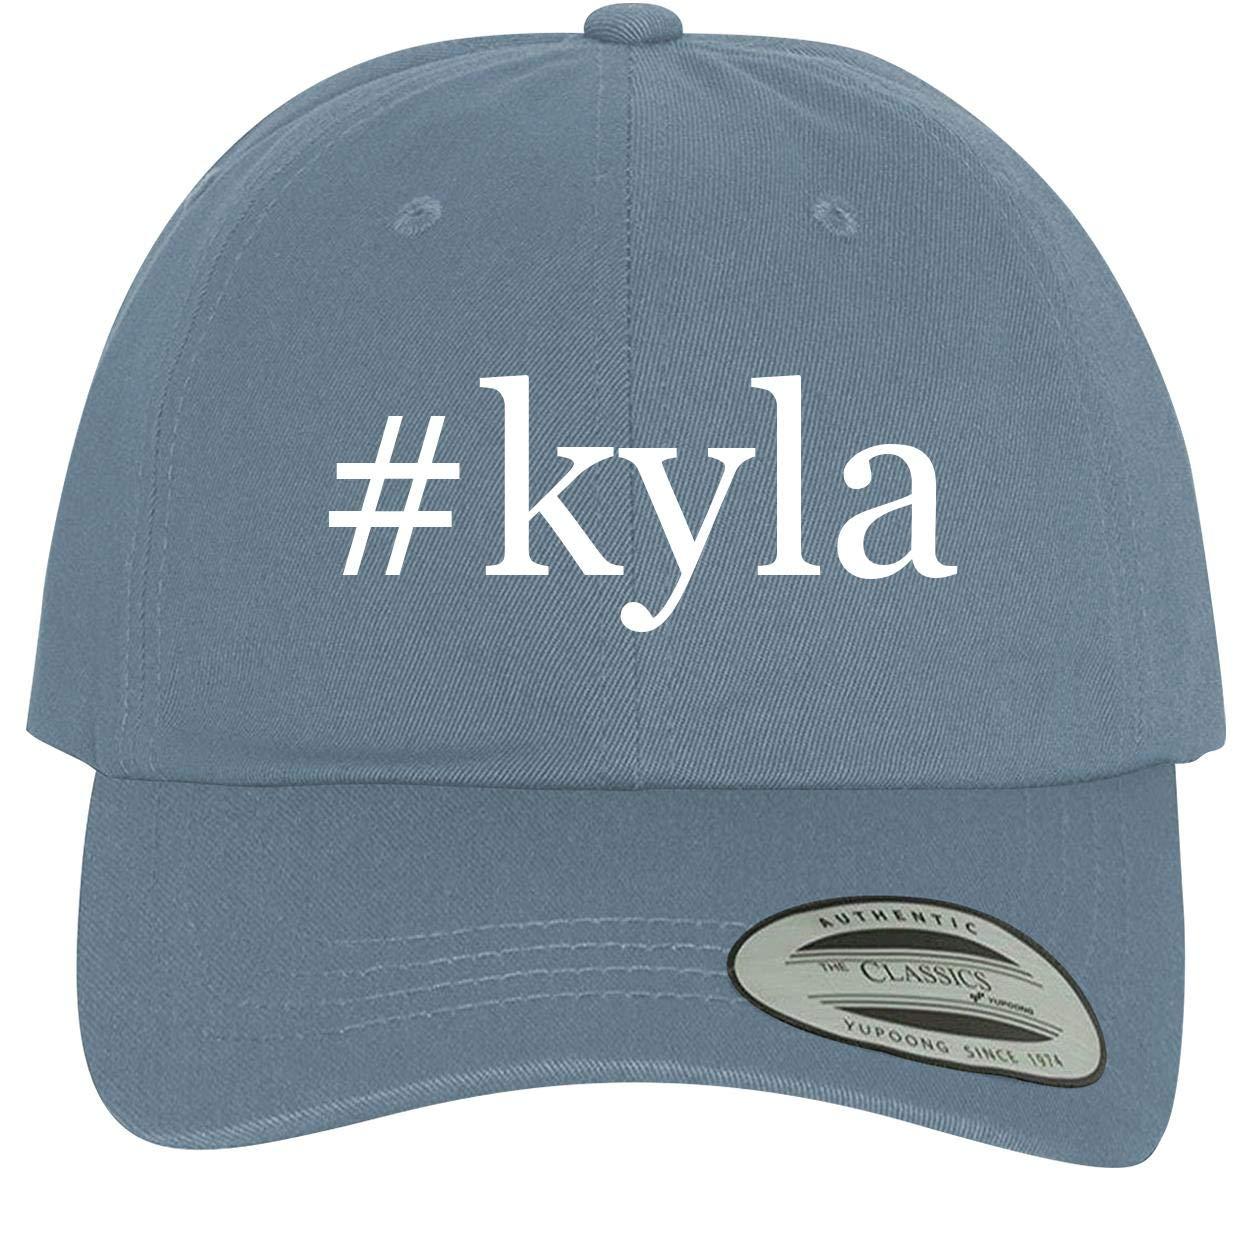 Comfortable Dad Hat Baseball Cap BH Cool Designs #kyla